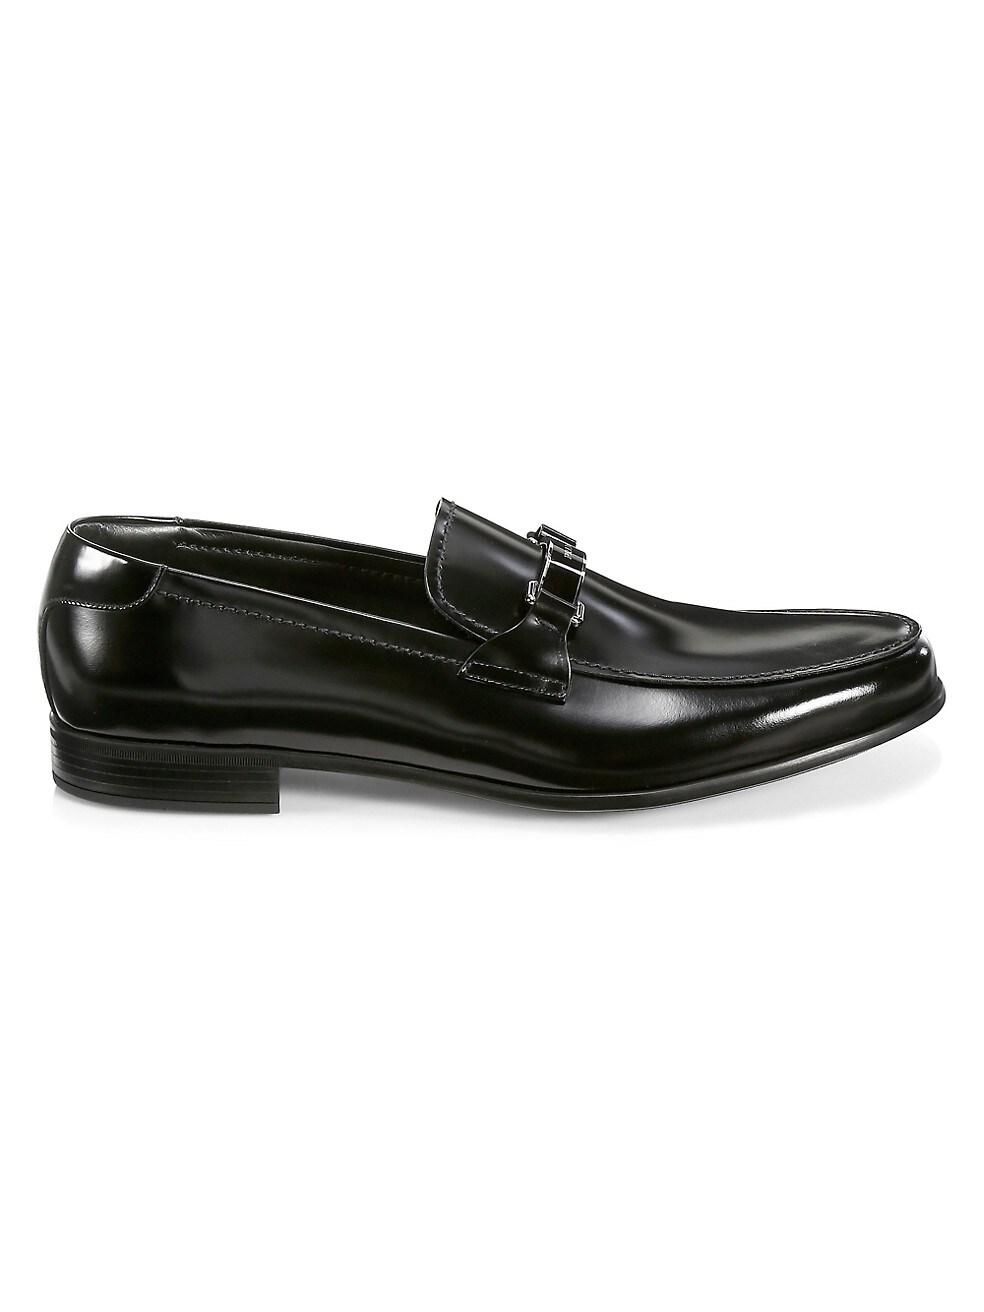 Prada Spazzalato Brushed Leather Loafers